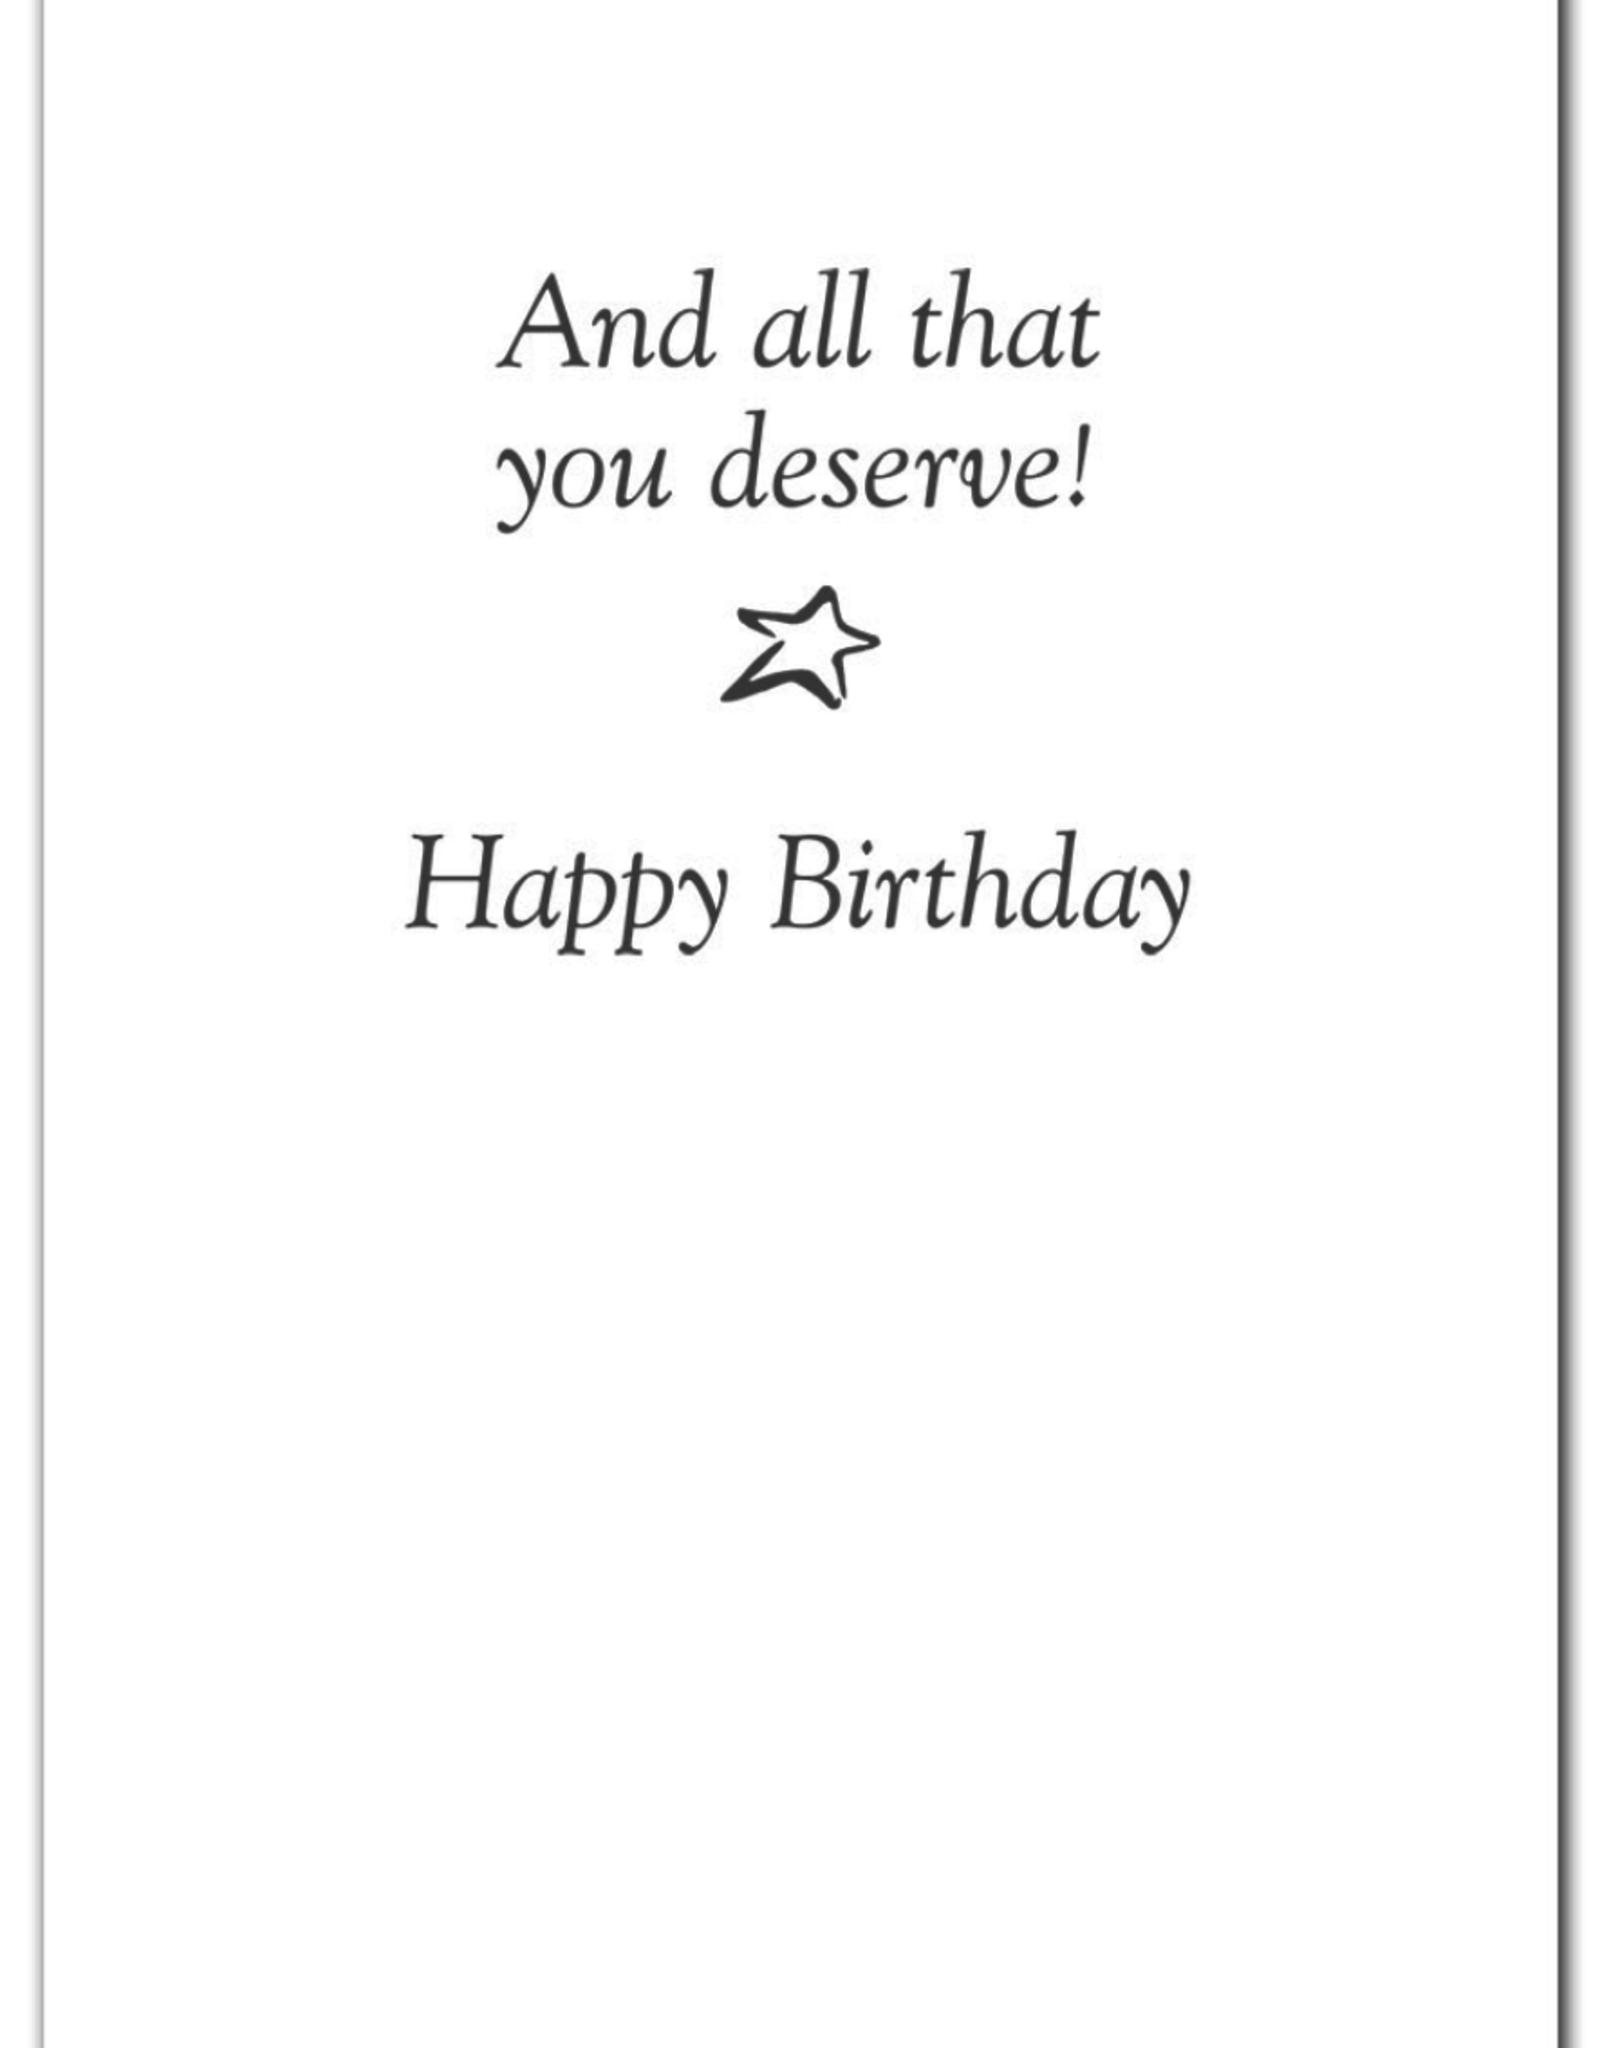 Cardthartic Cardthartic - Birthday Candles in Dark Card